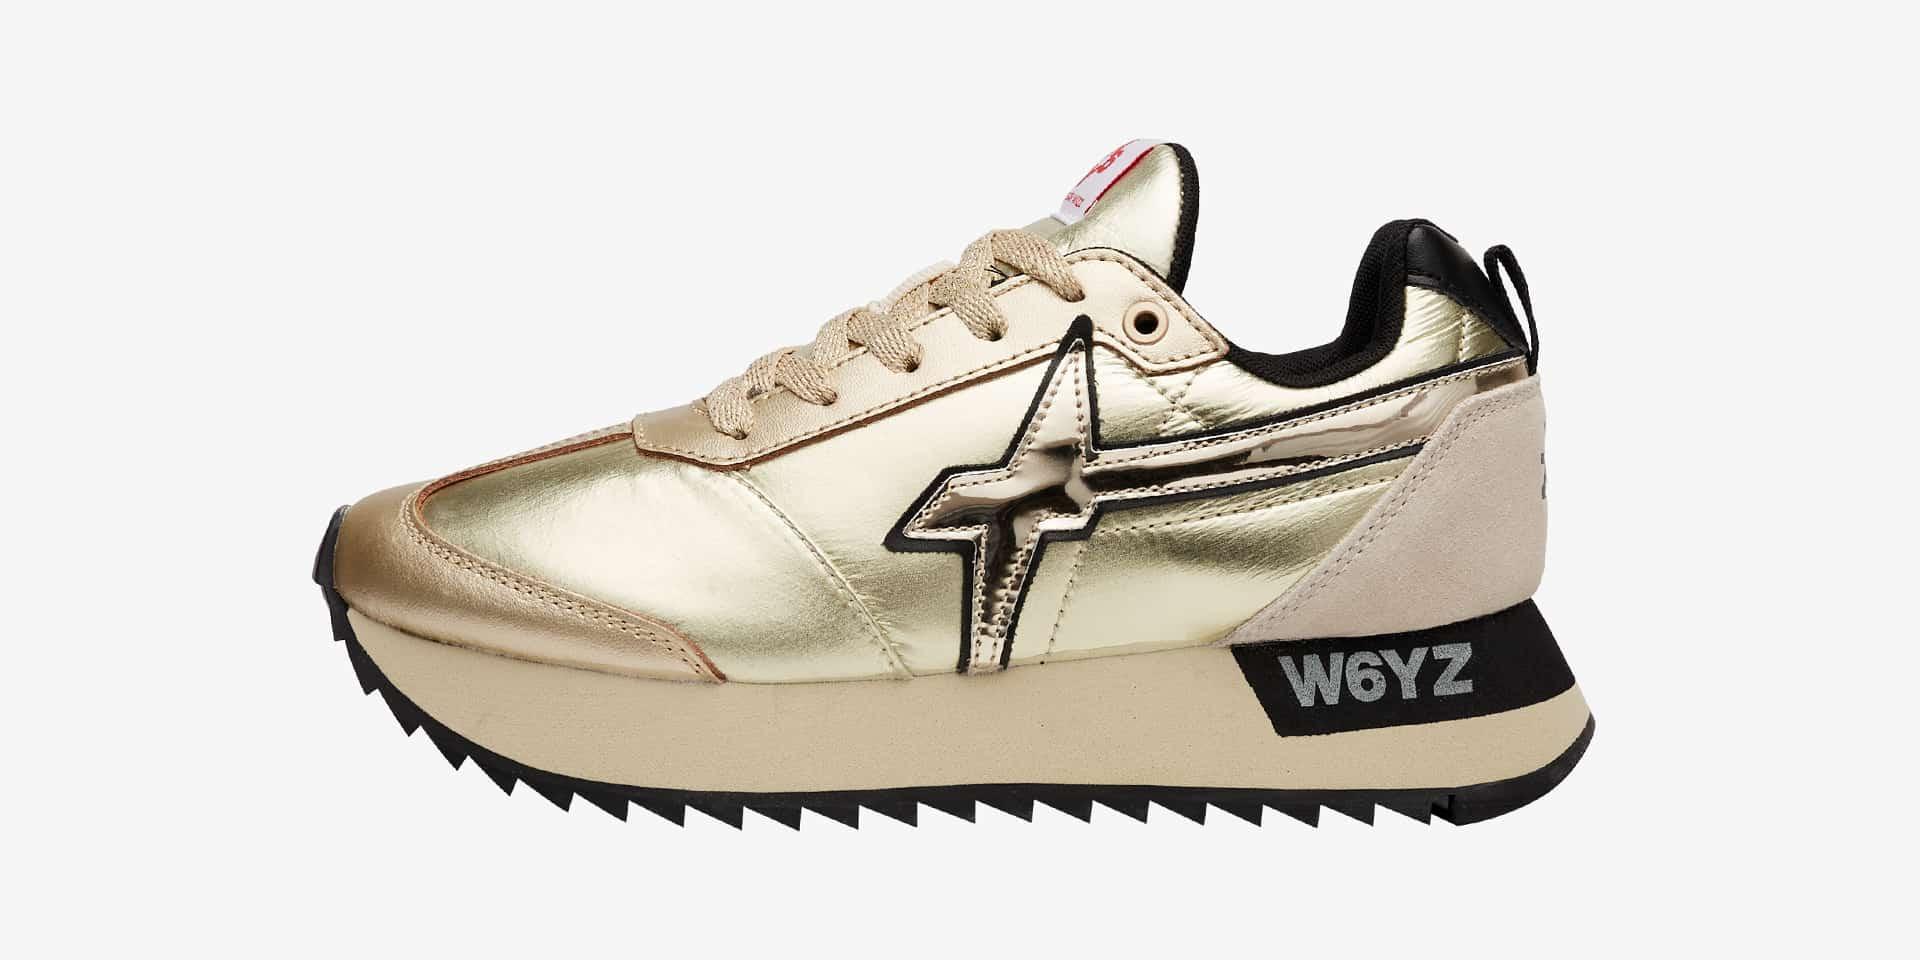 KIS-W. - Sneaker in tessuto tecnico - Platino